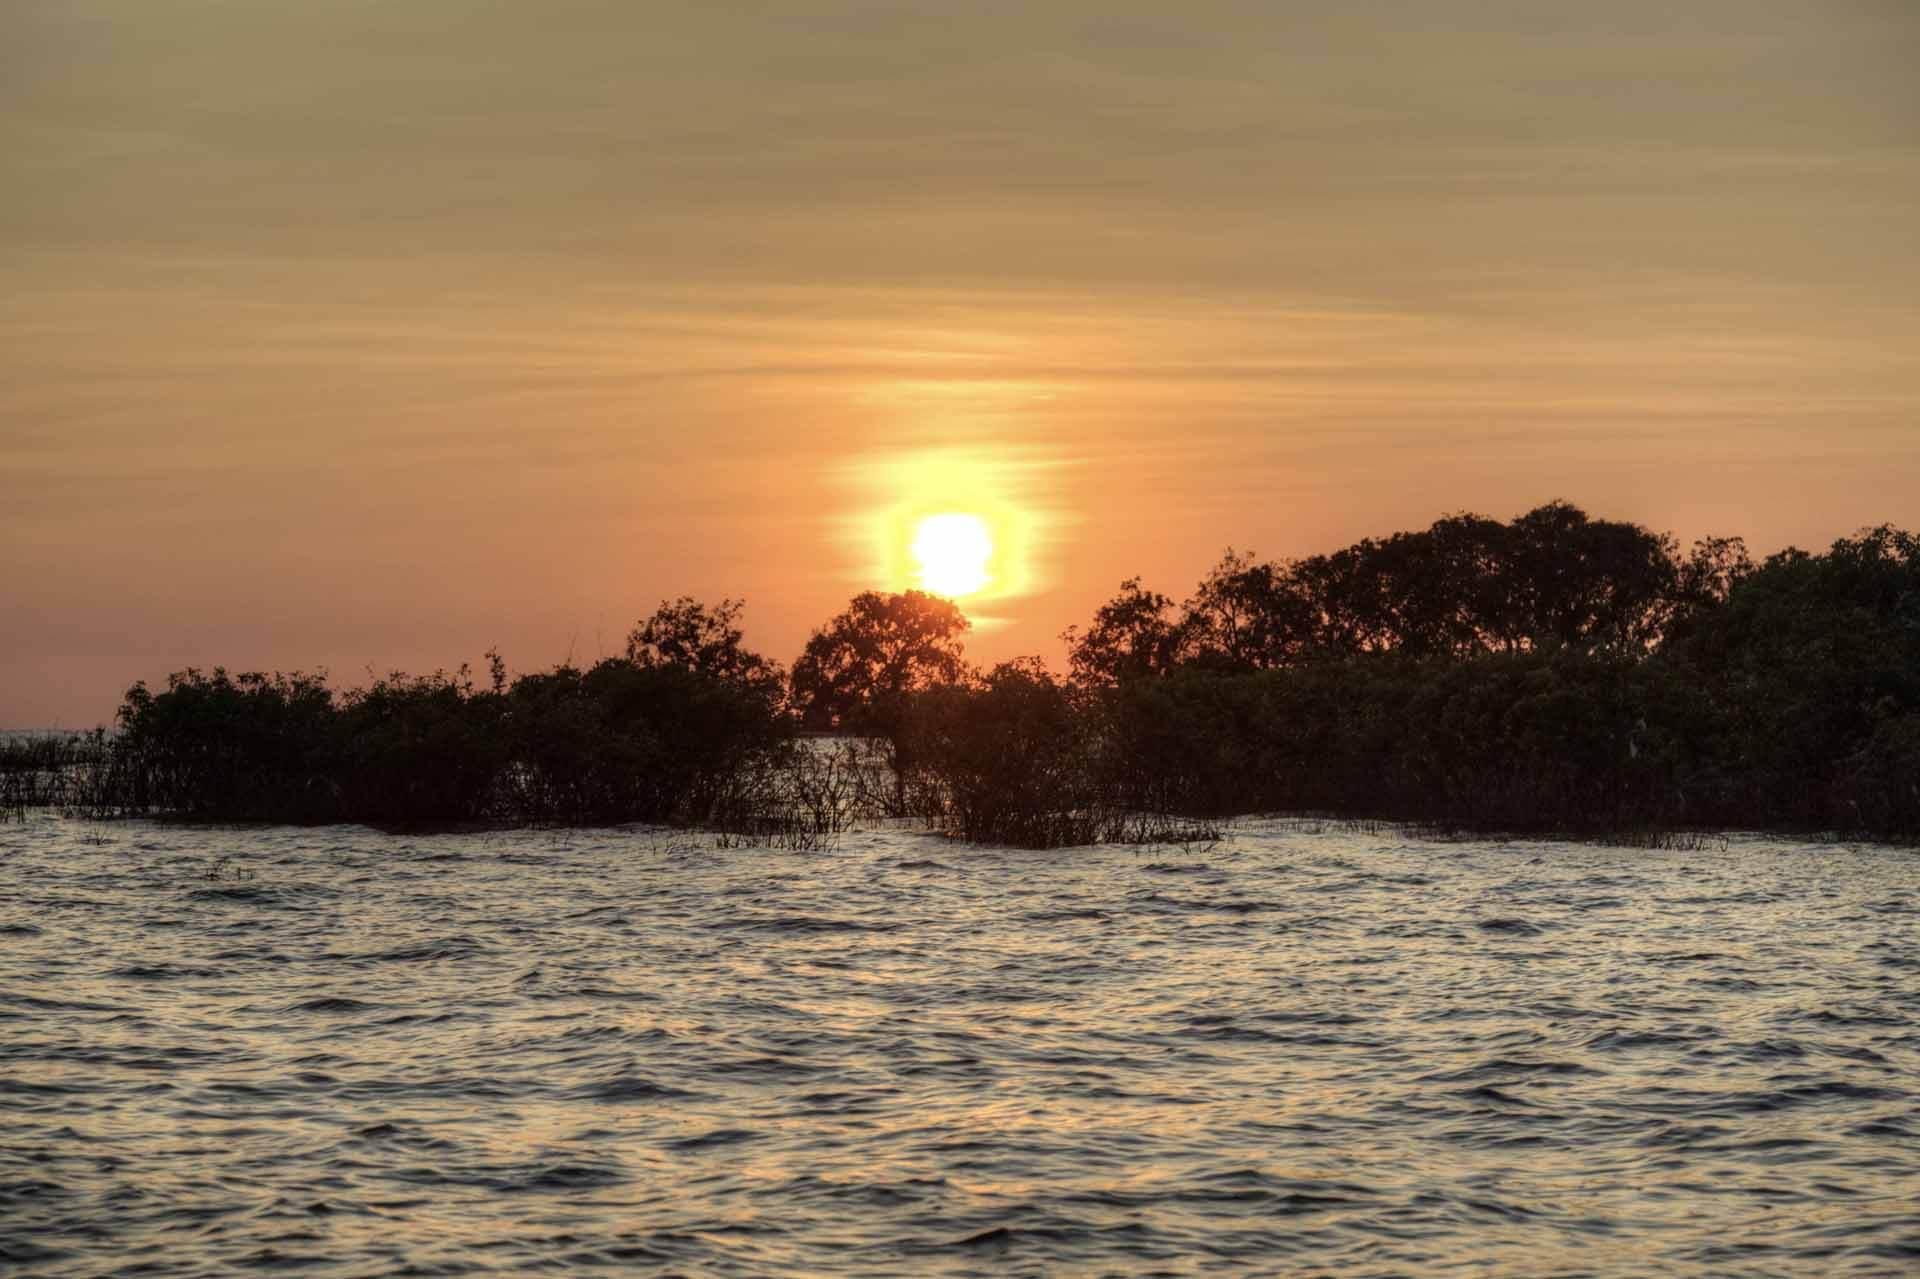 Tonle-Sap-See in Kambodscha